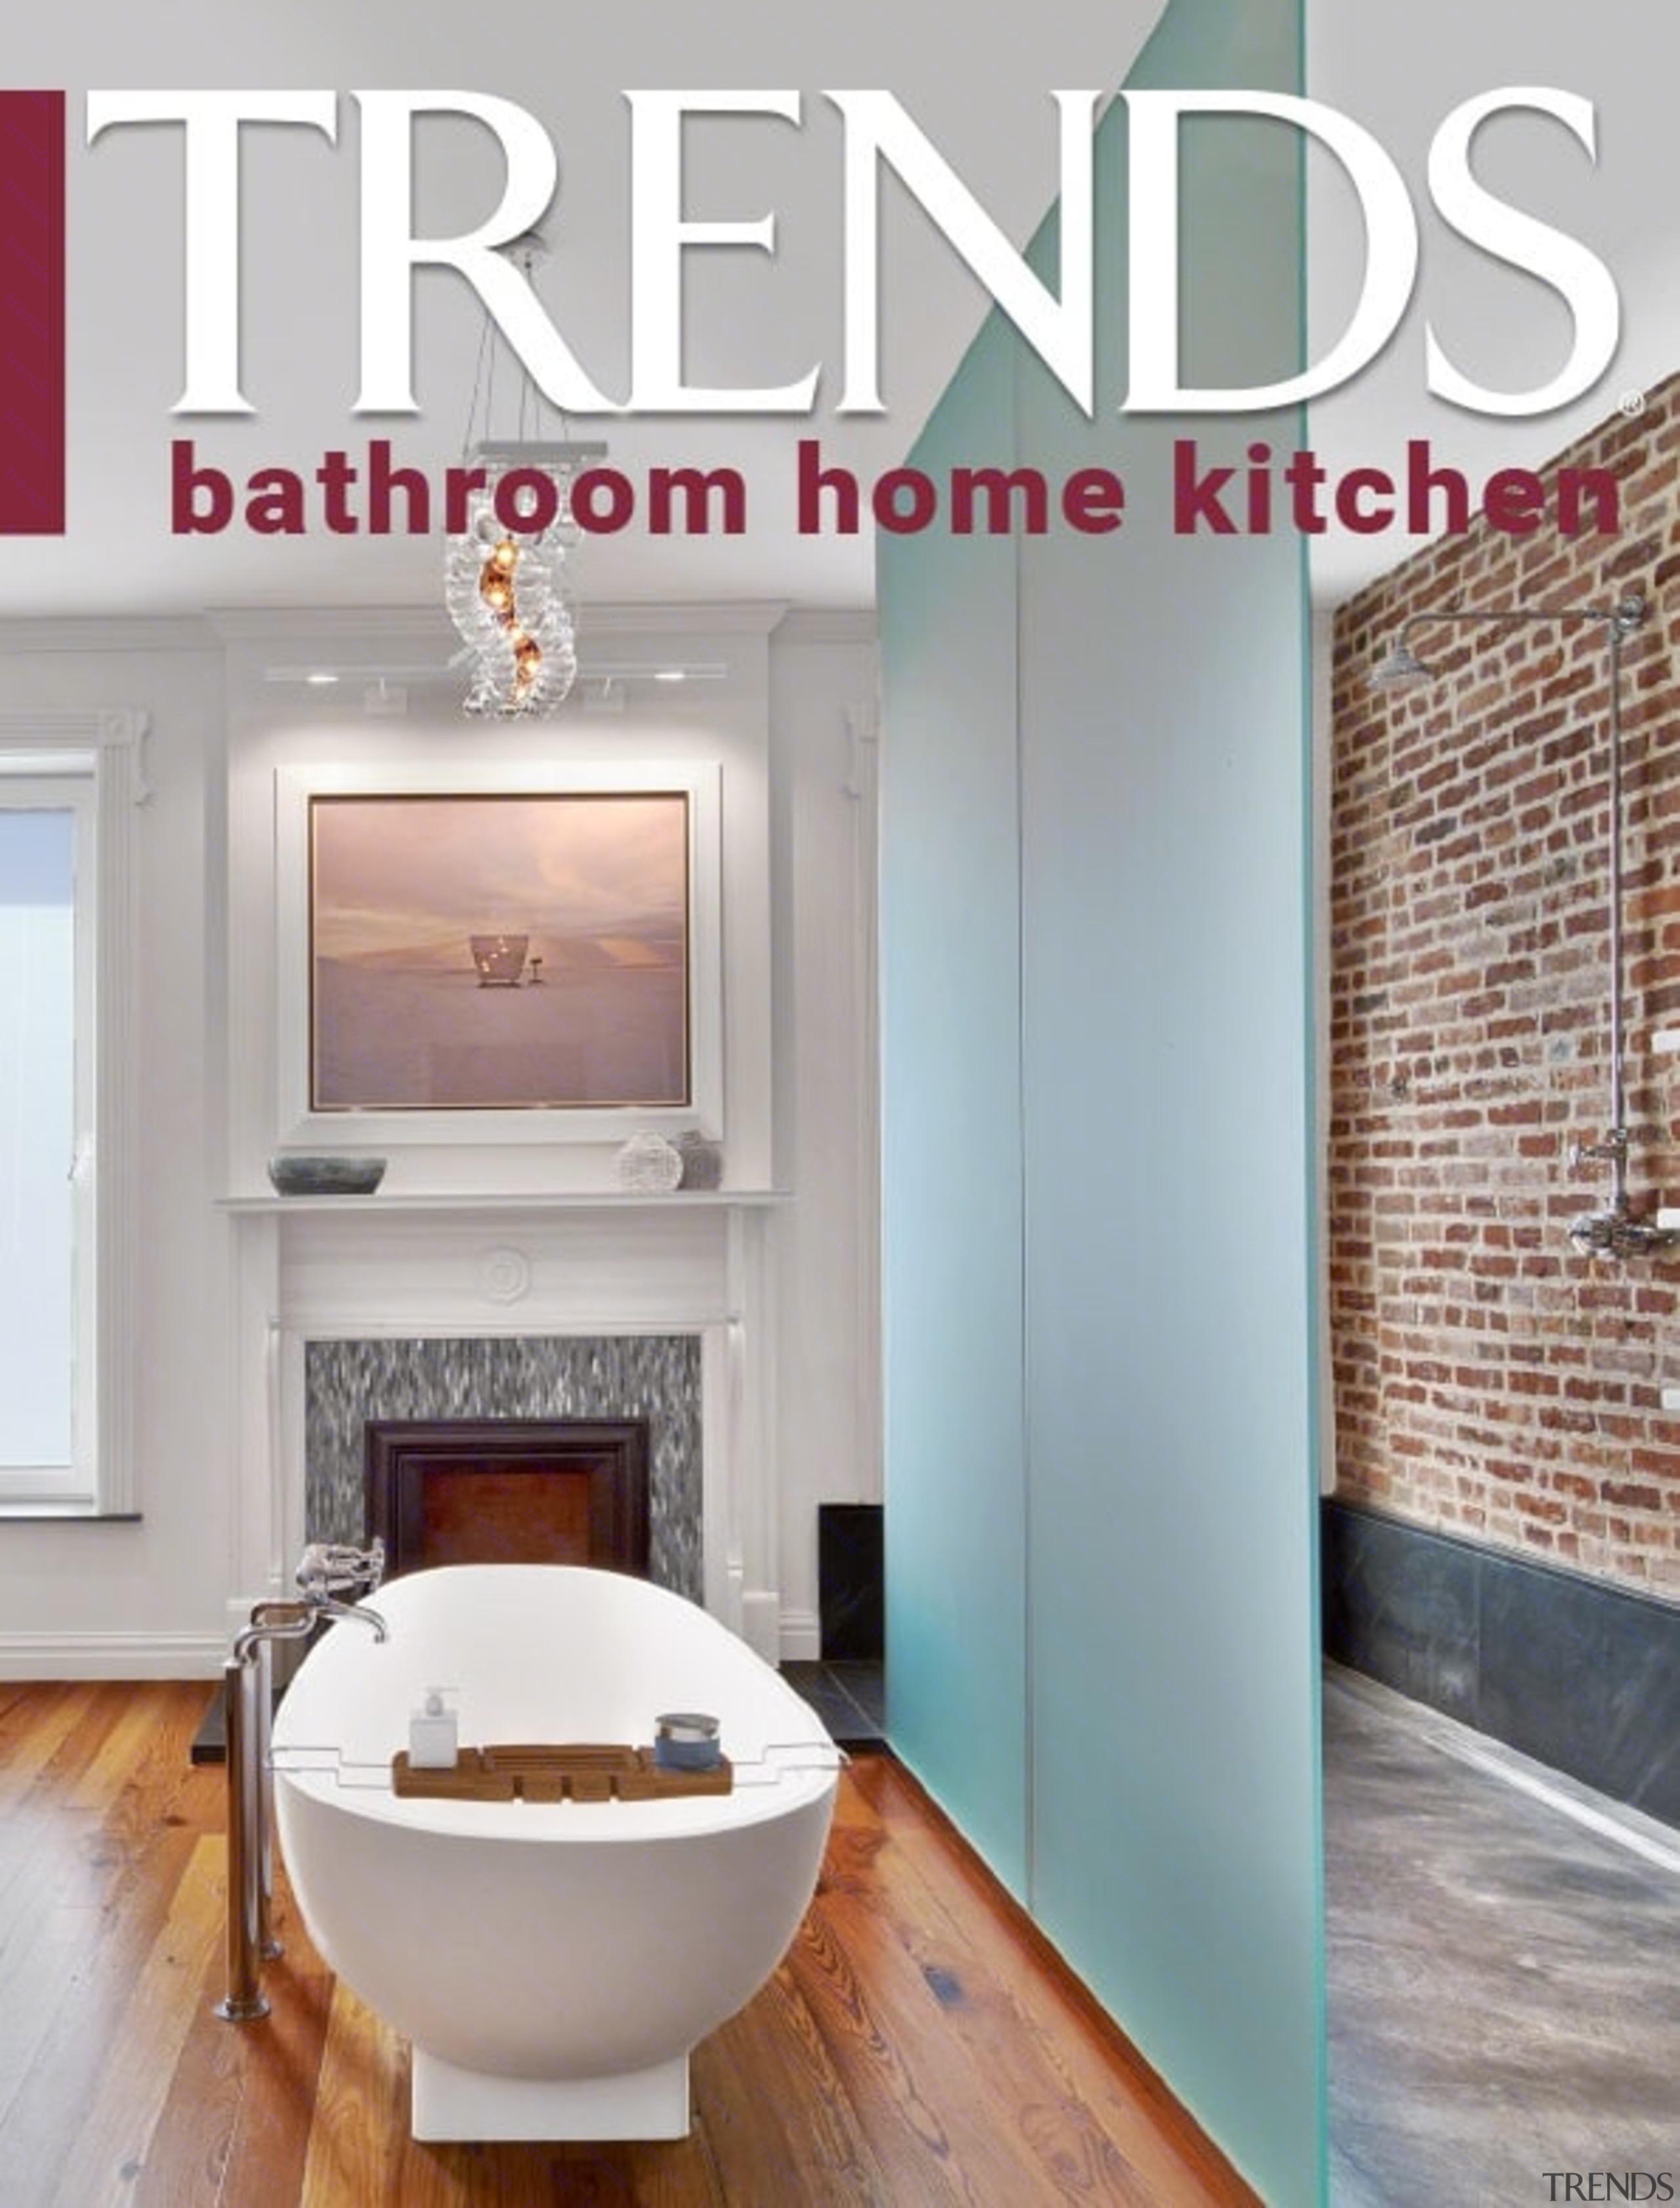 Nz3305 Minicover bathroom, floor, flooring, home, interior design, room, sink, wall, gray